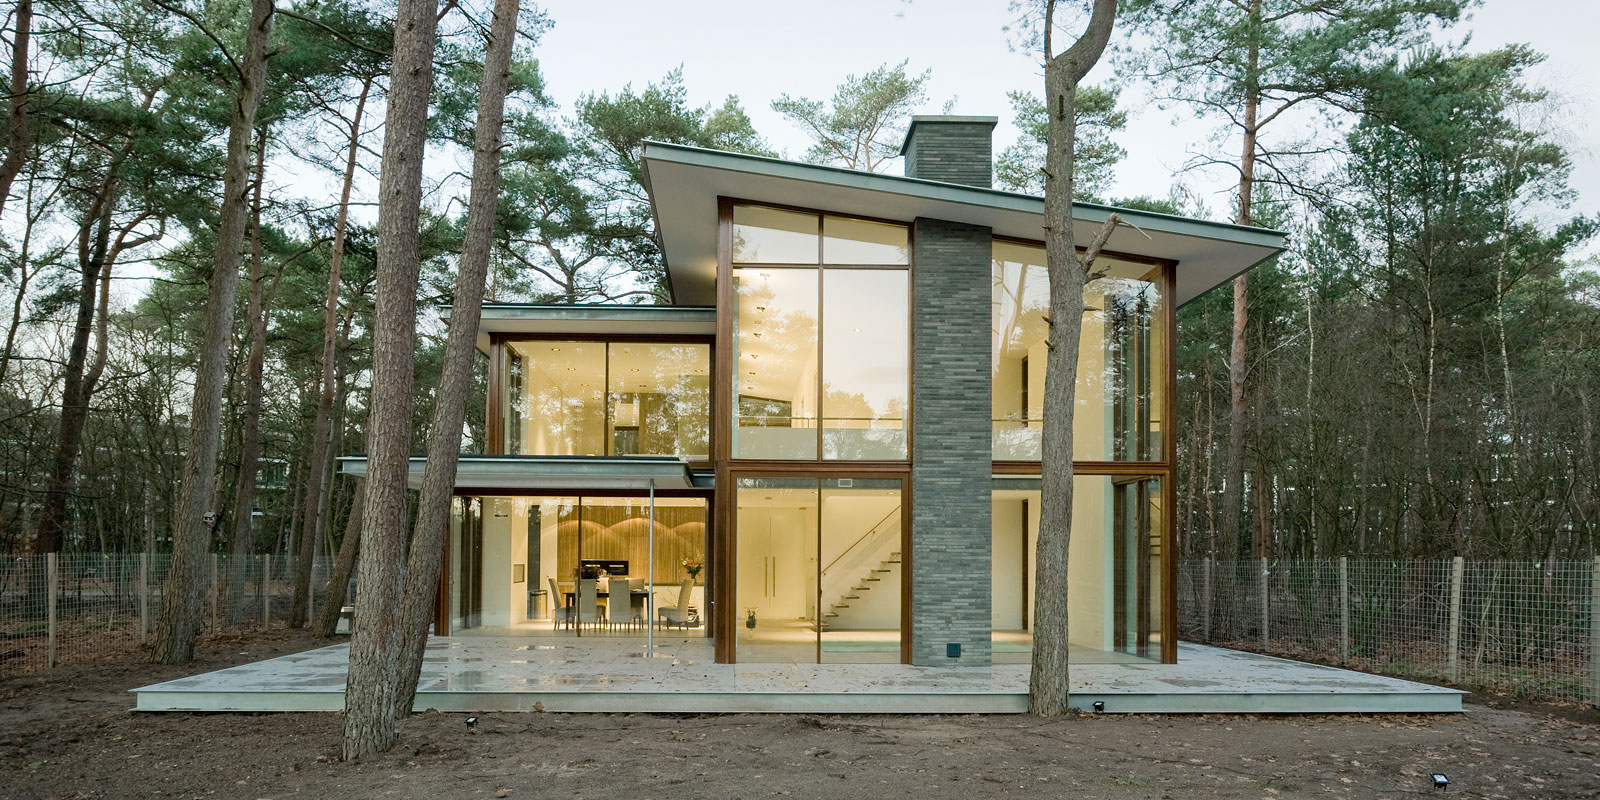 Licht inval, Van Dinther Bouwbedrijf,Moderne villa, Raampartijen, Glas gevelbekleding, Bosrijke omgeving